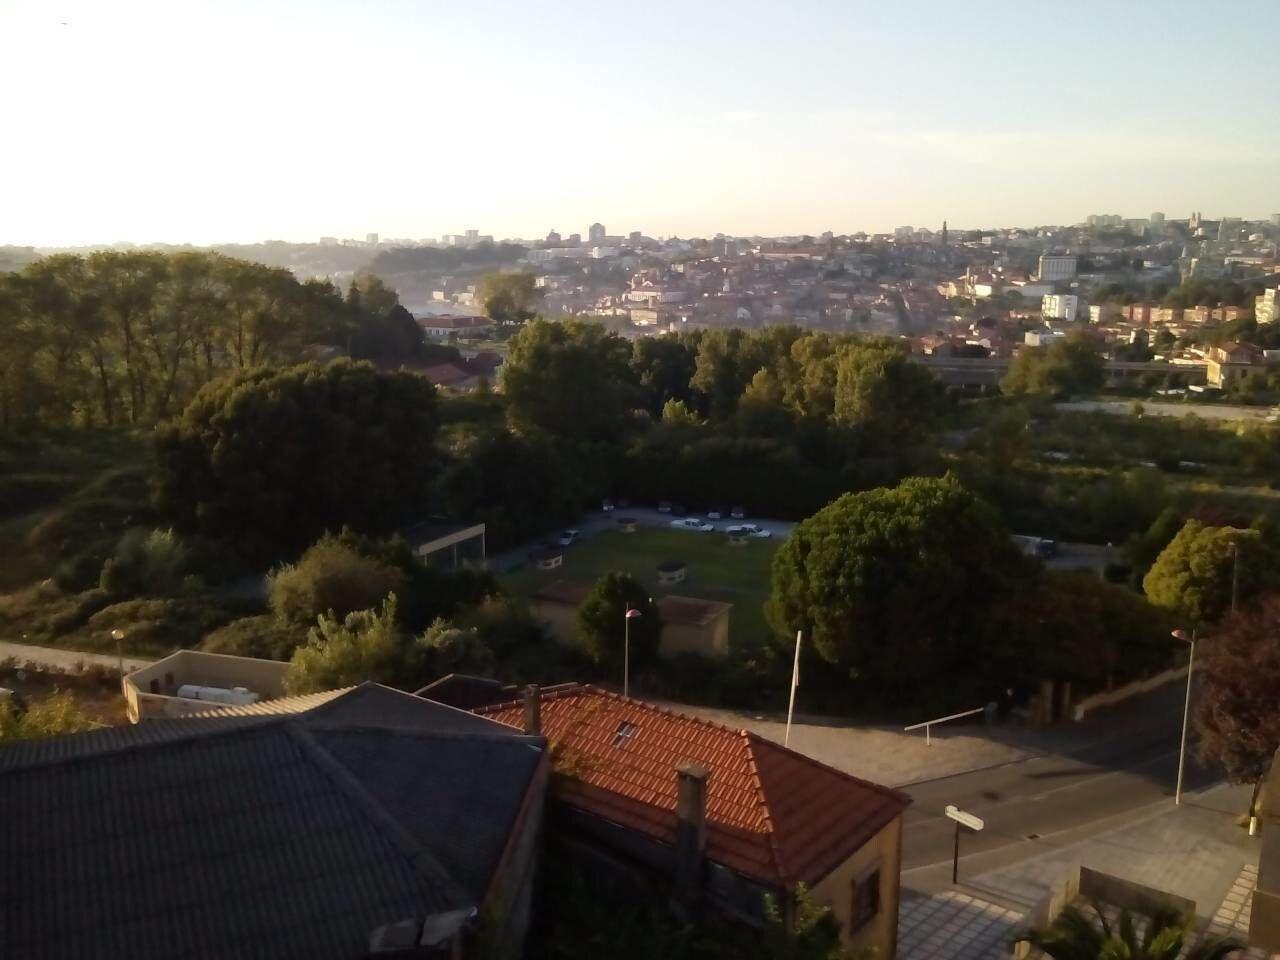 Douro Riverside Apartment, Vila Nova de Gaia